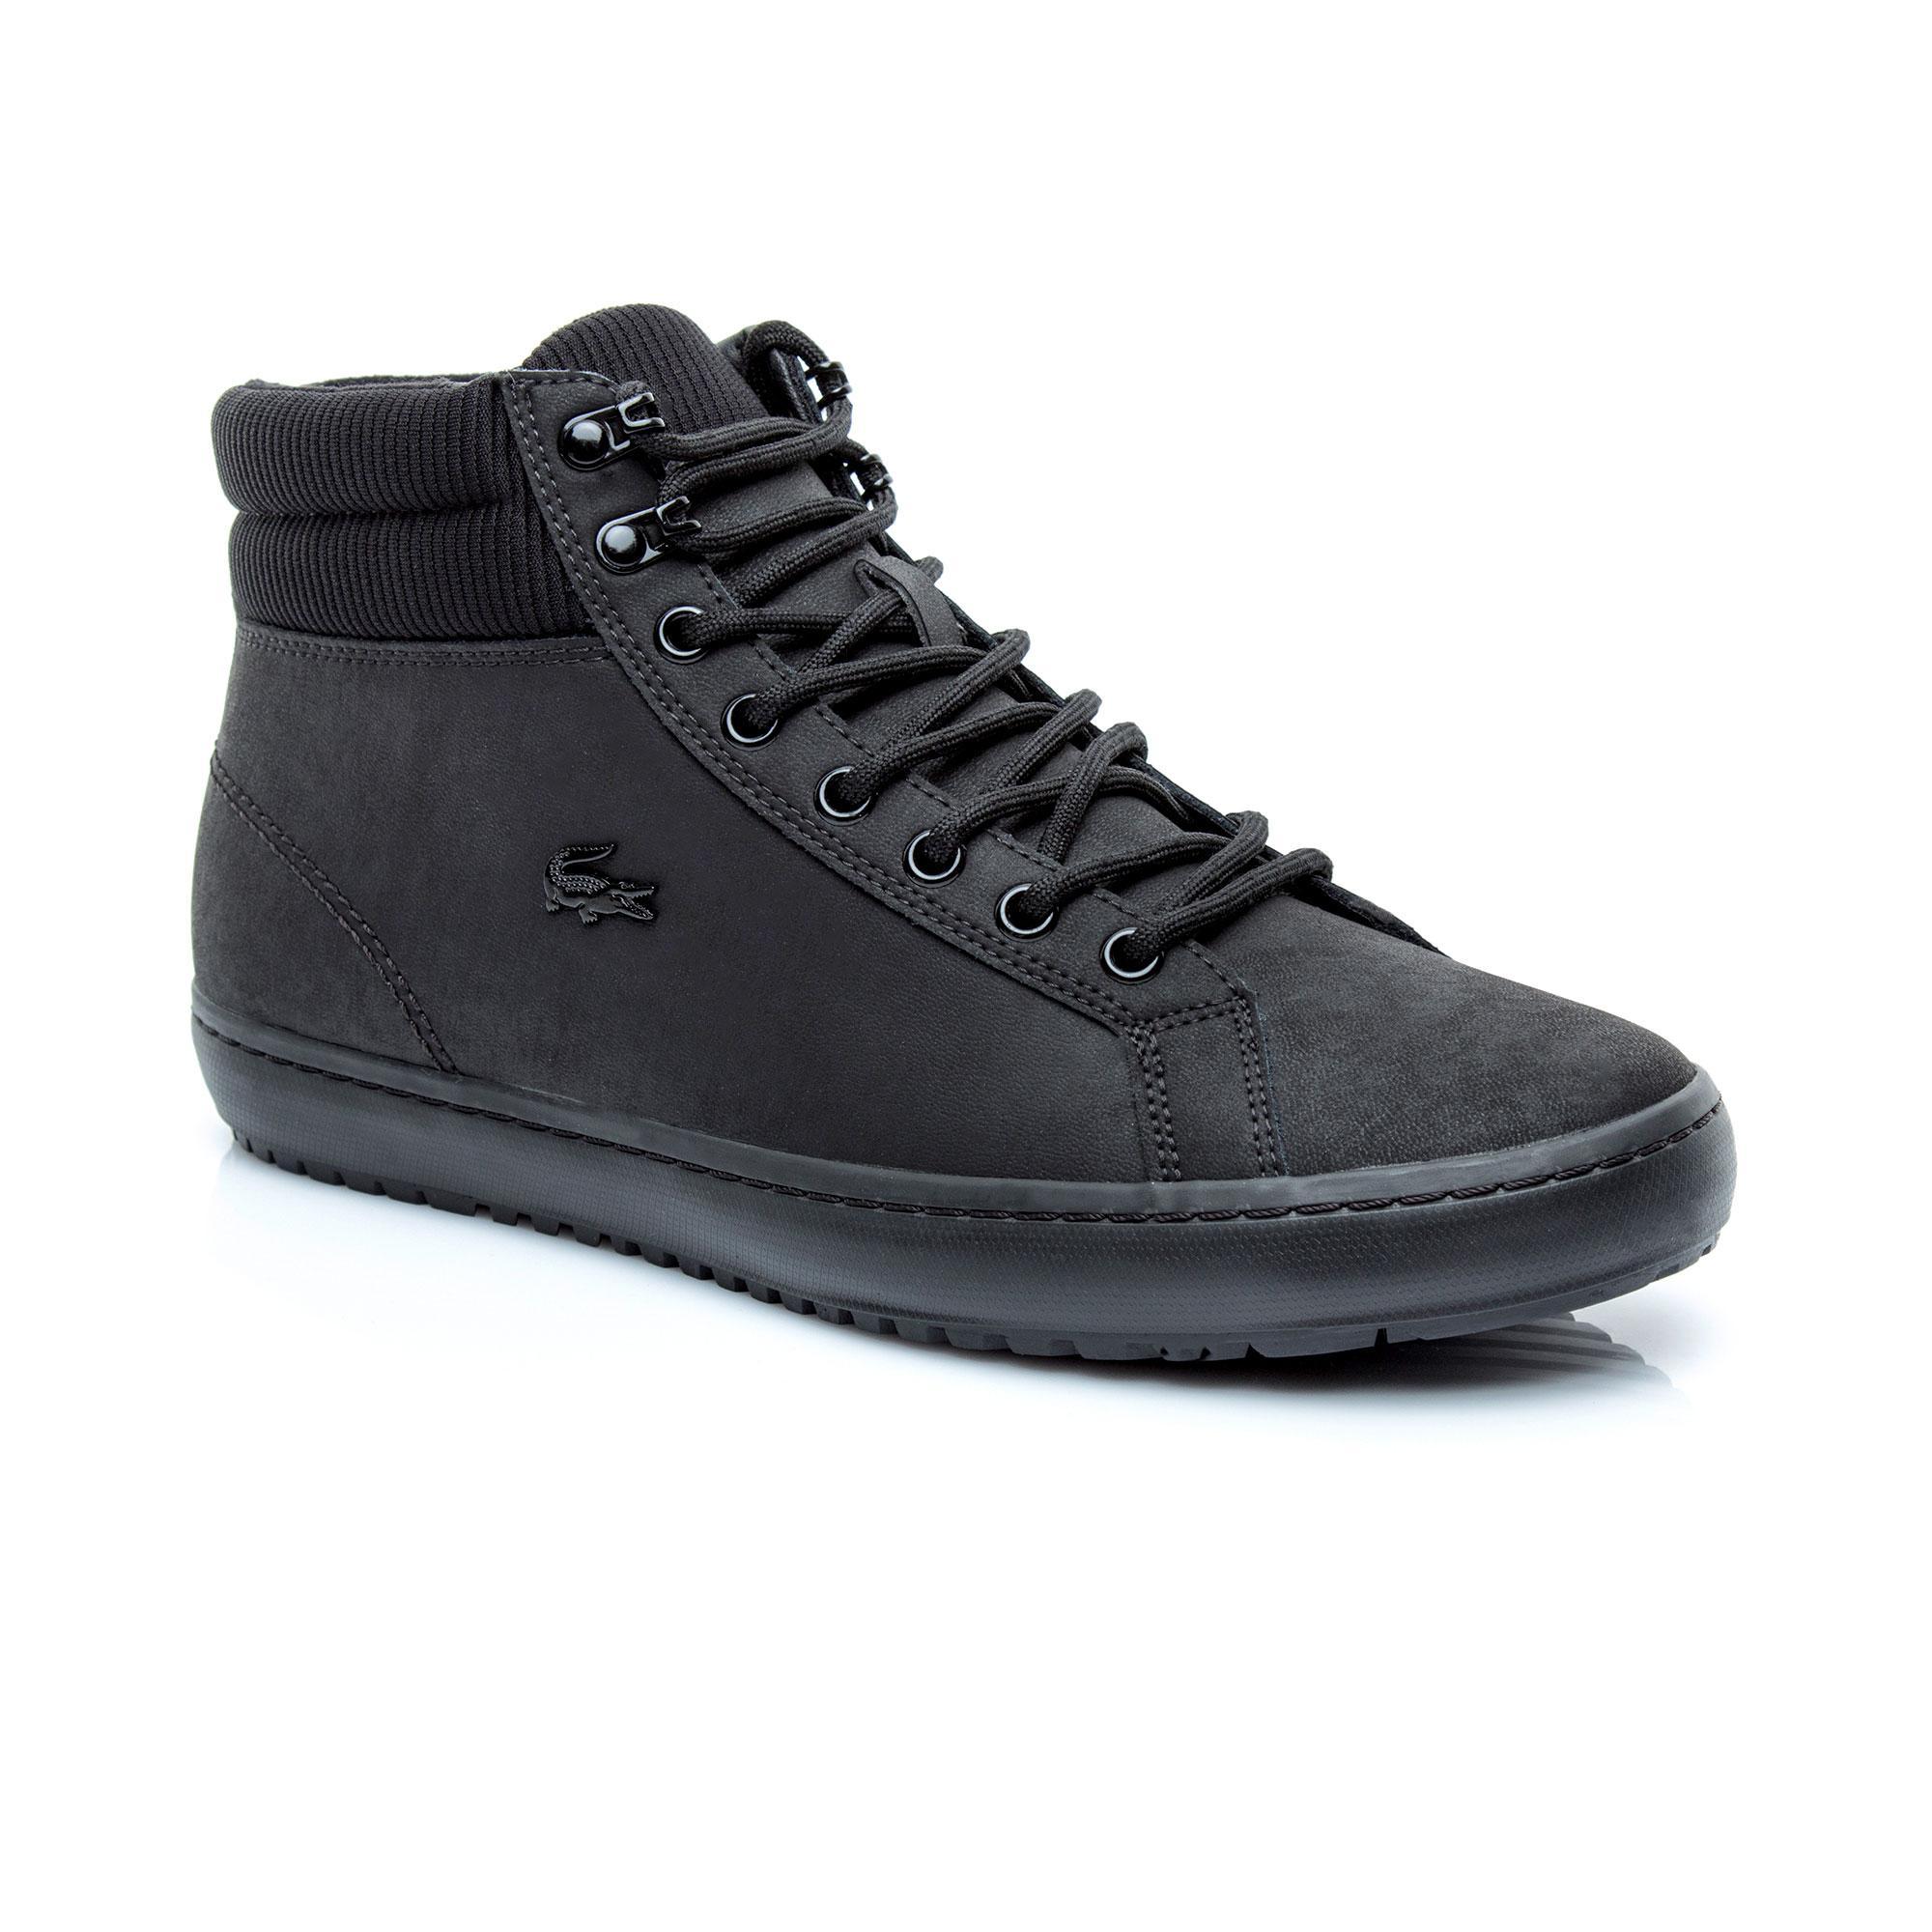 Lacoste Erkek Straightset Insulac 3181 Siyah Sneaker